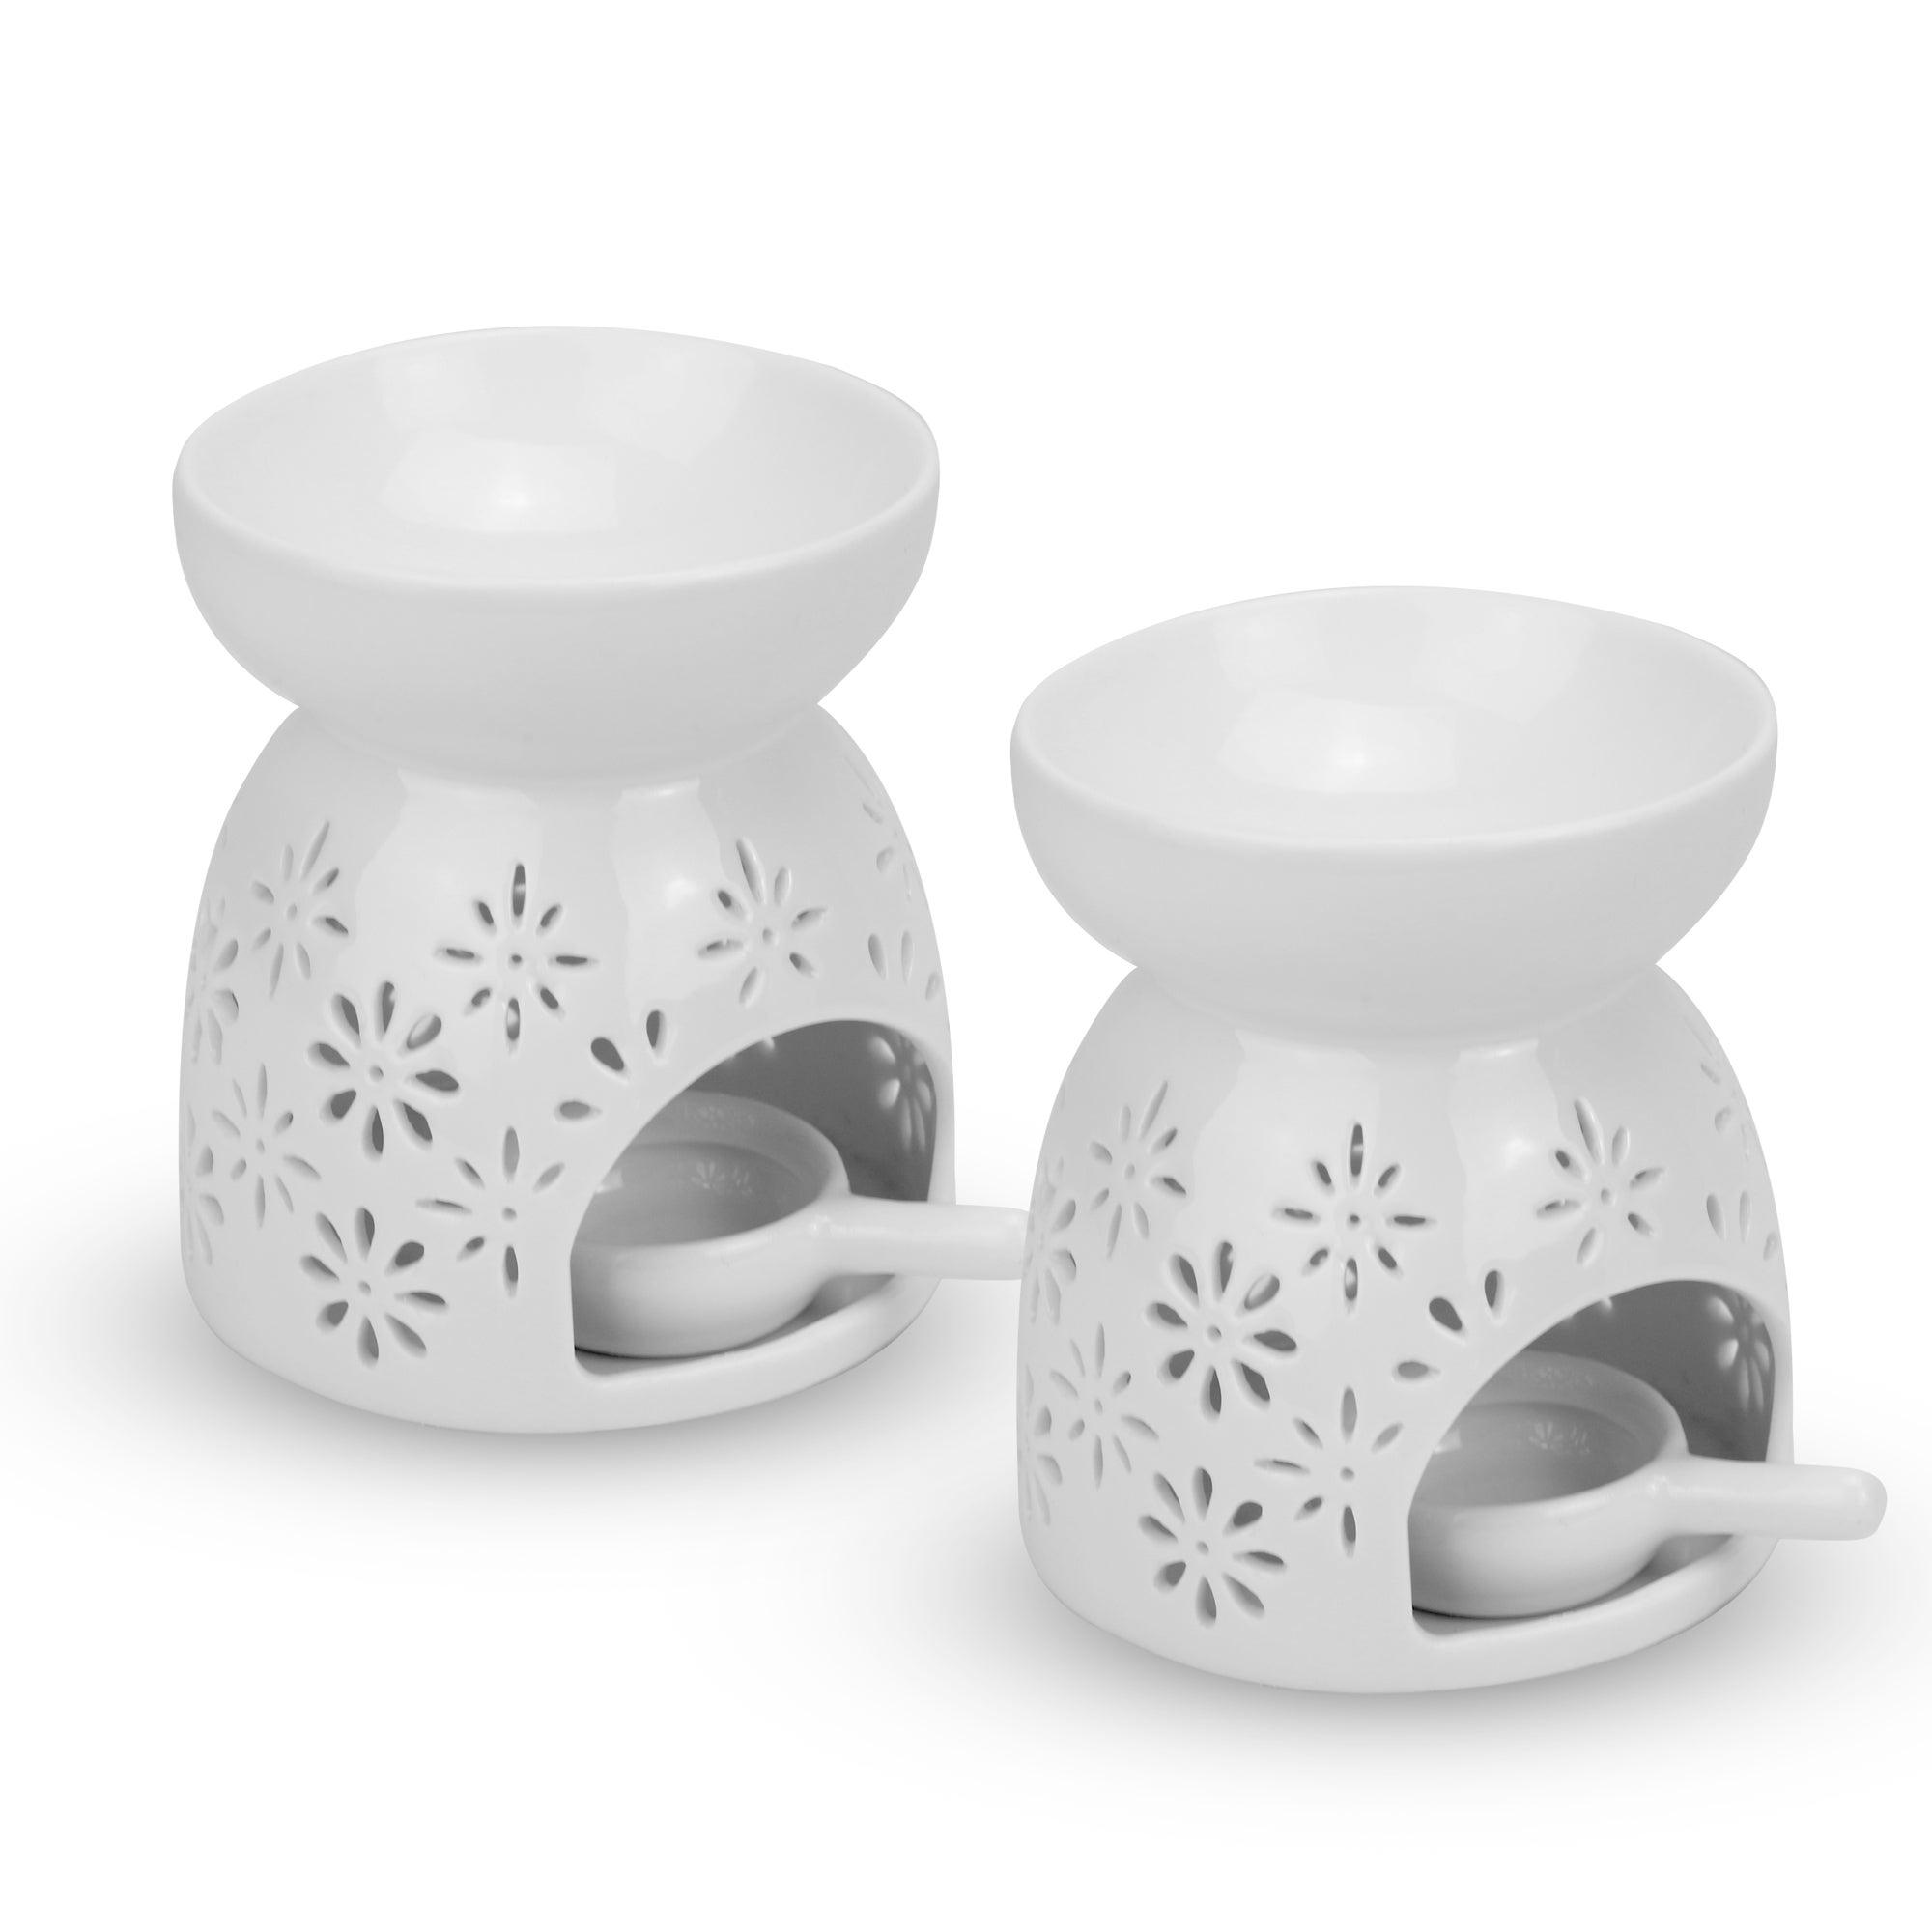 Ceramic Oil Burners - Set of 2 - M&W Flowers